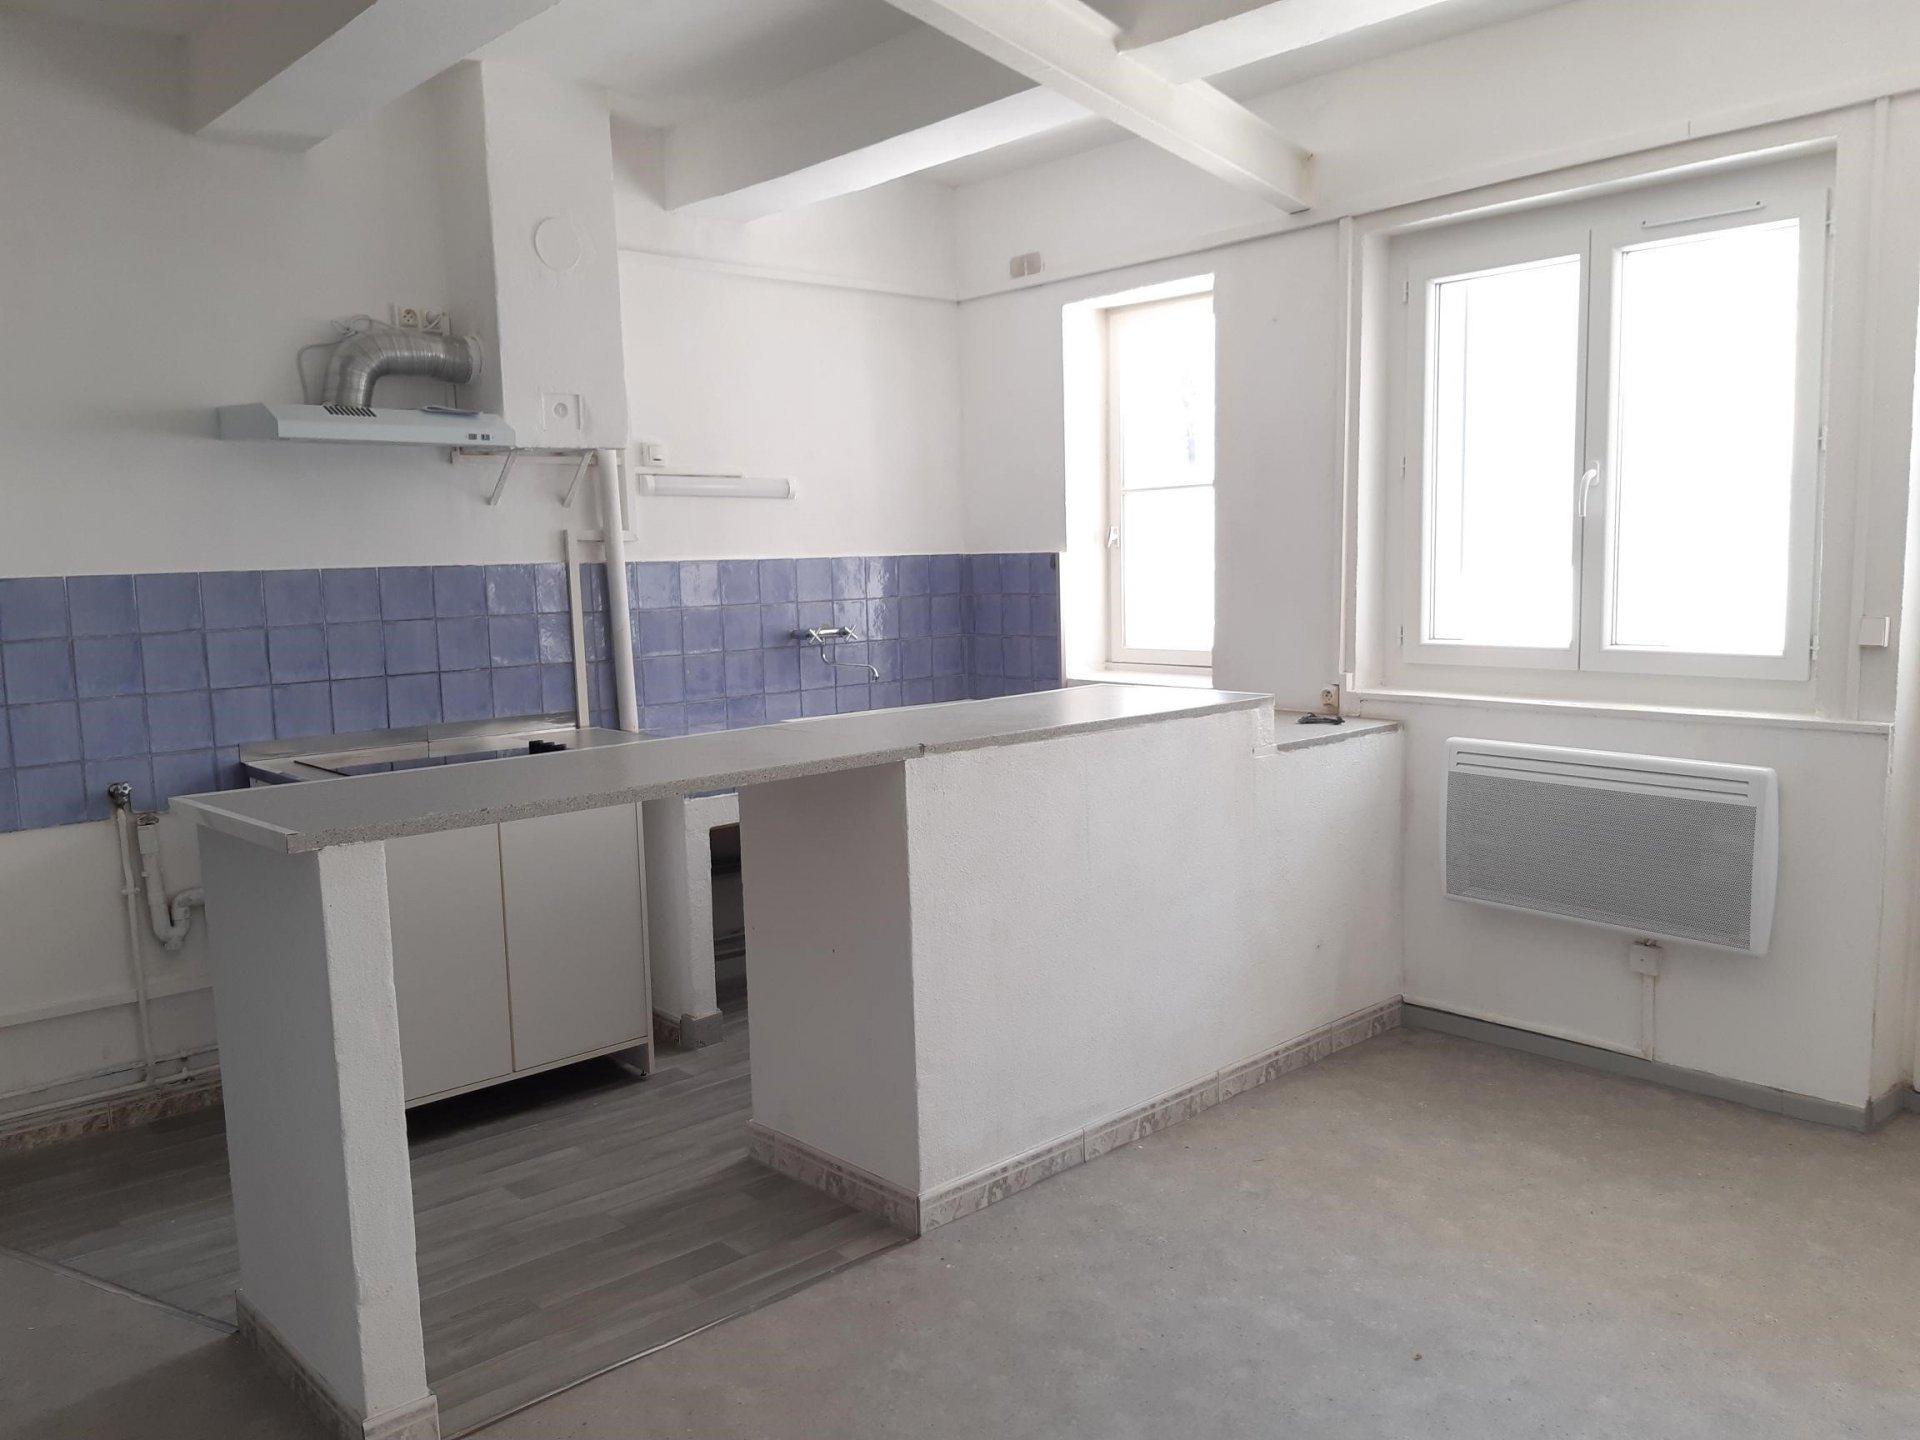 Location Appartement TARASCON surface habitable de 50 m²